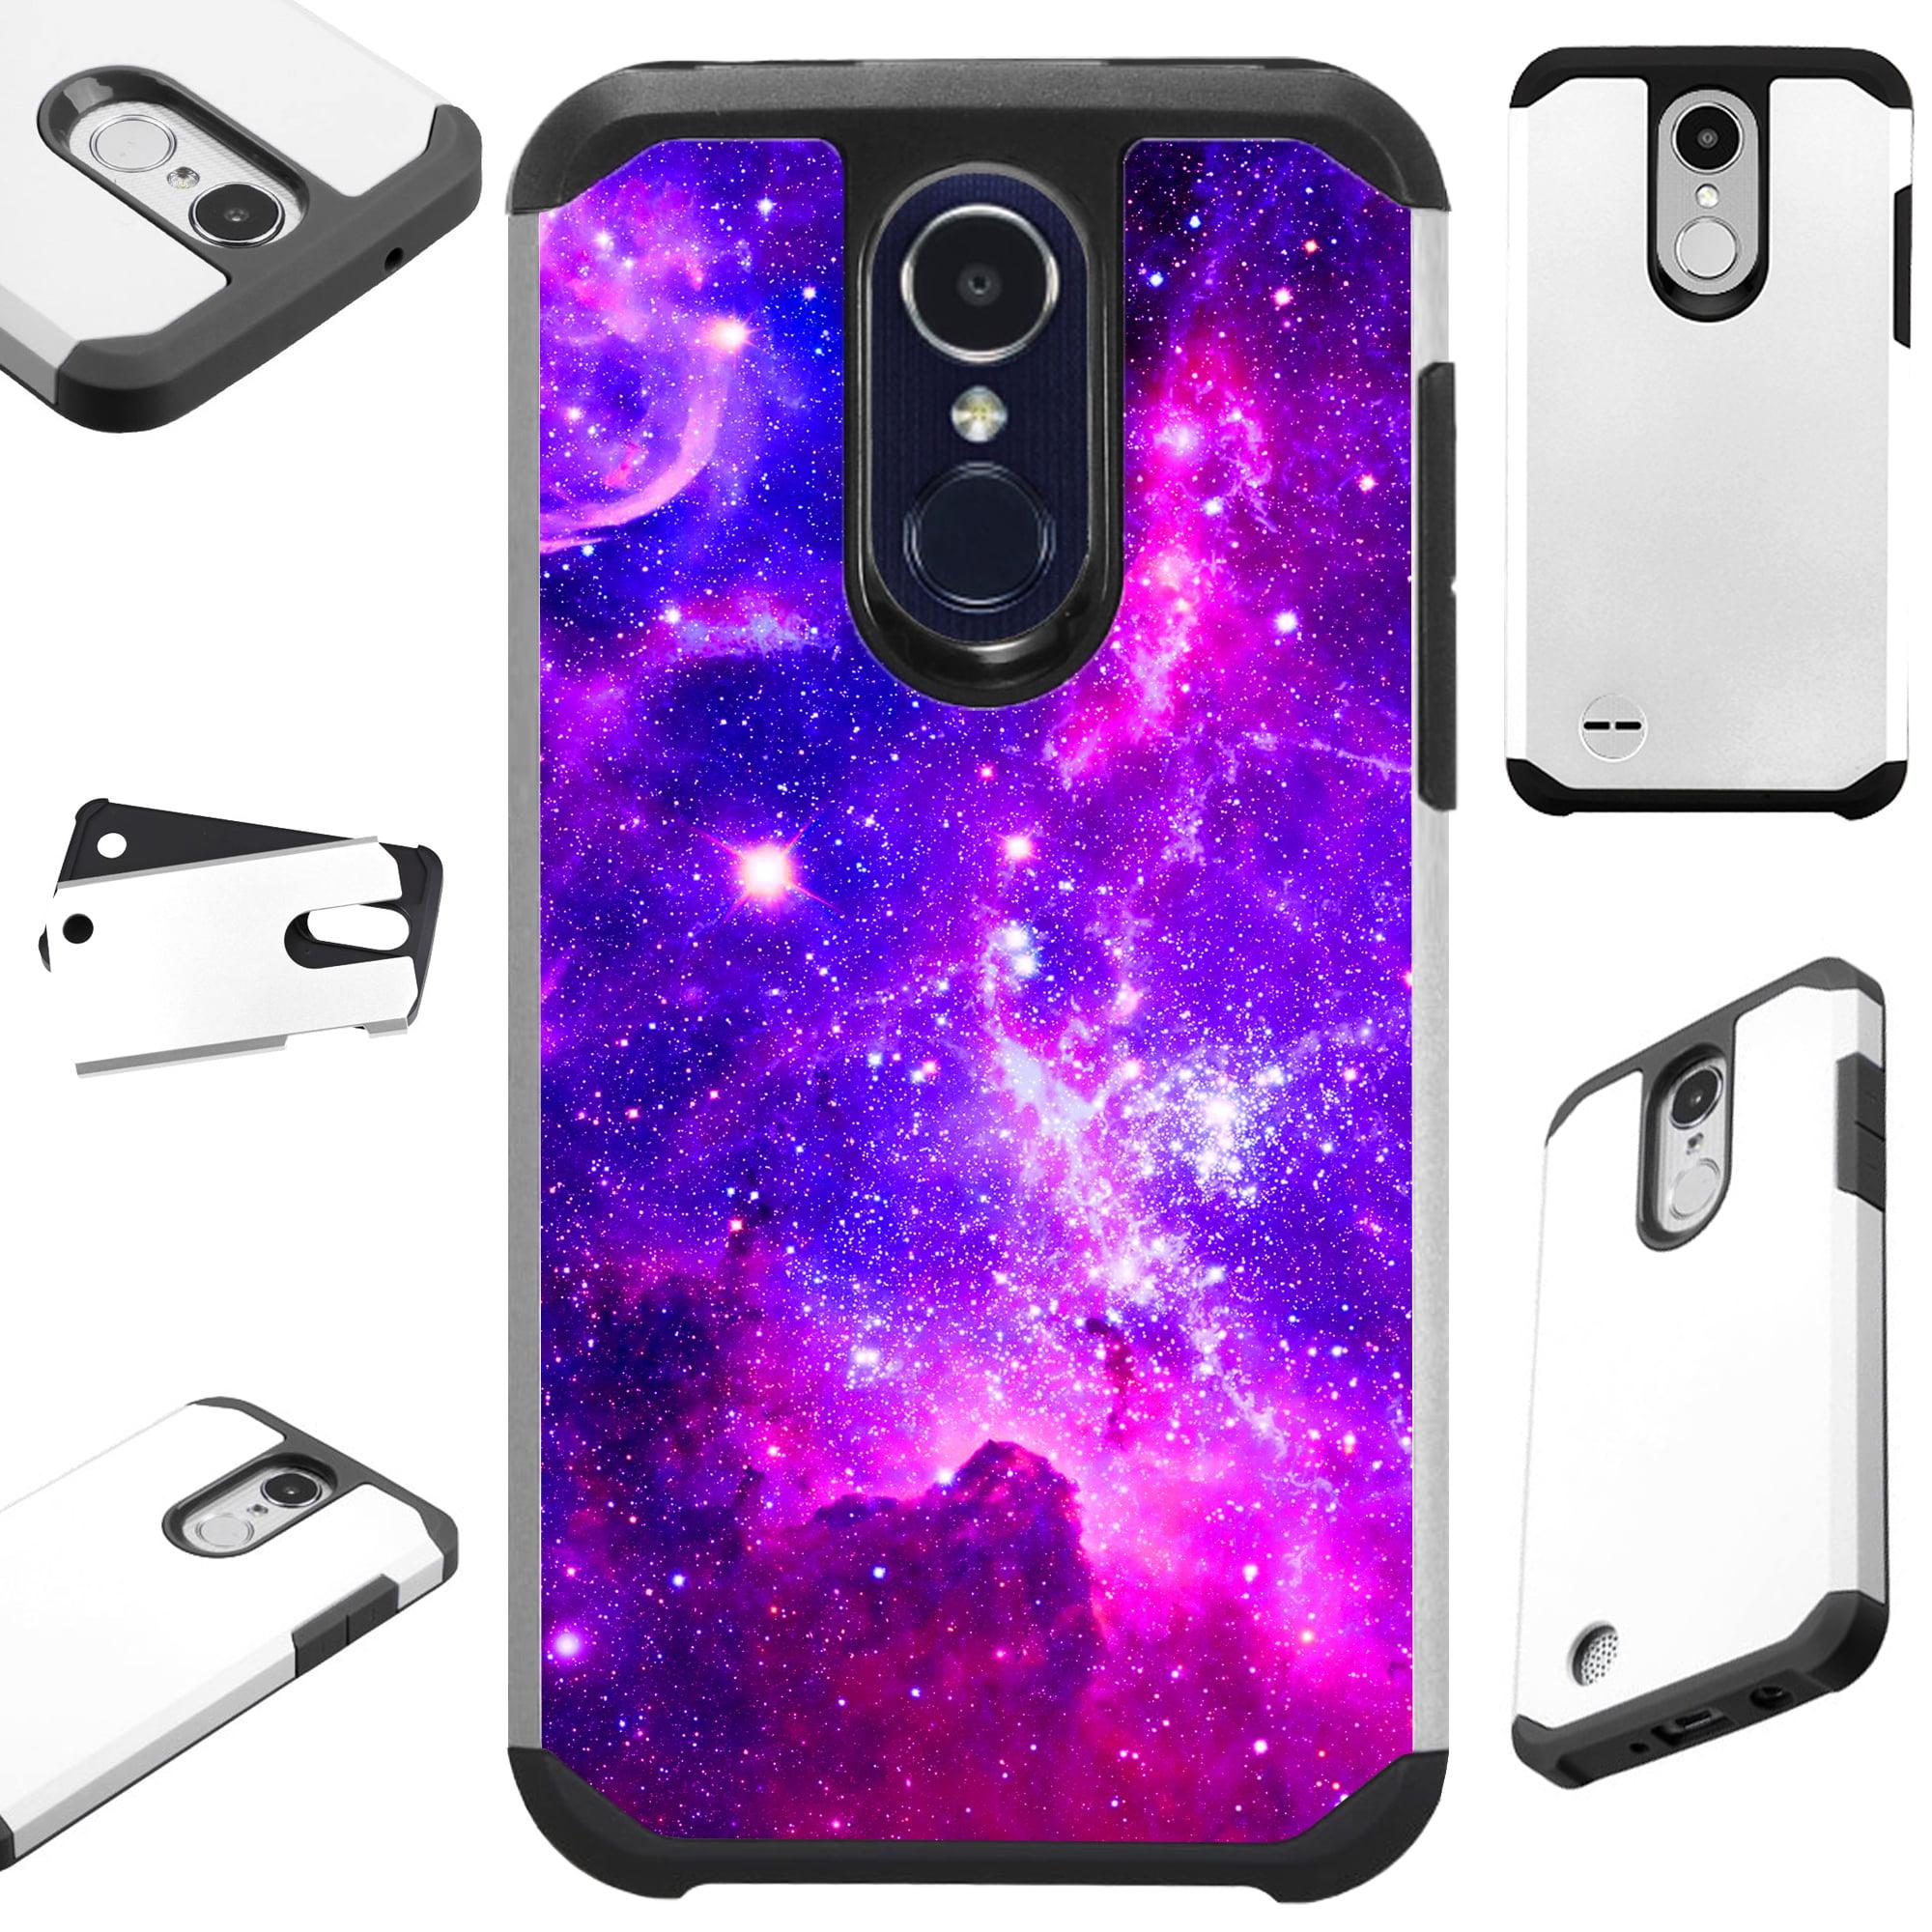 FusionGuard Phone Case Cover For LG K30 X410 | K10 (2018) | K10 Plus | K10 Alpha (Purple Universe)